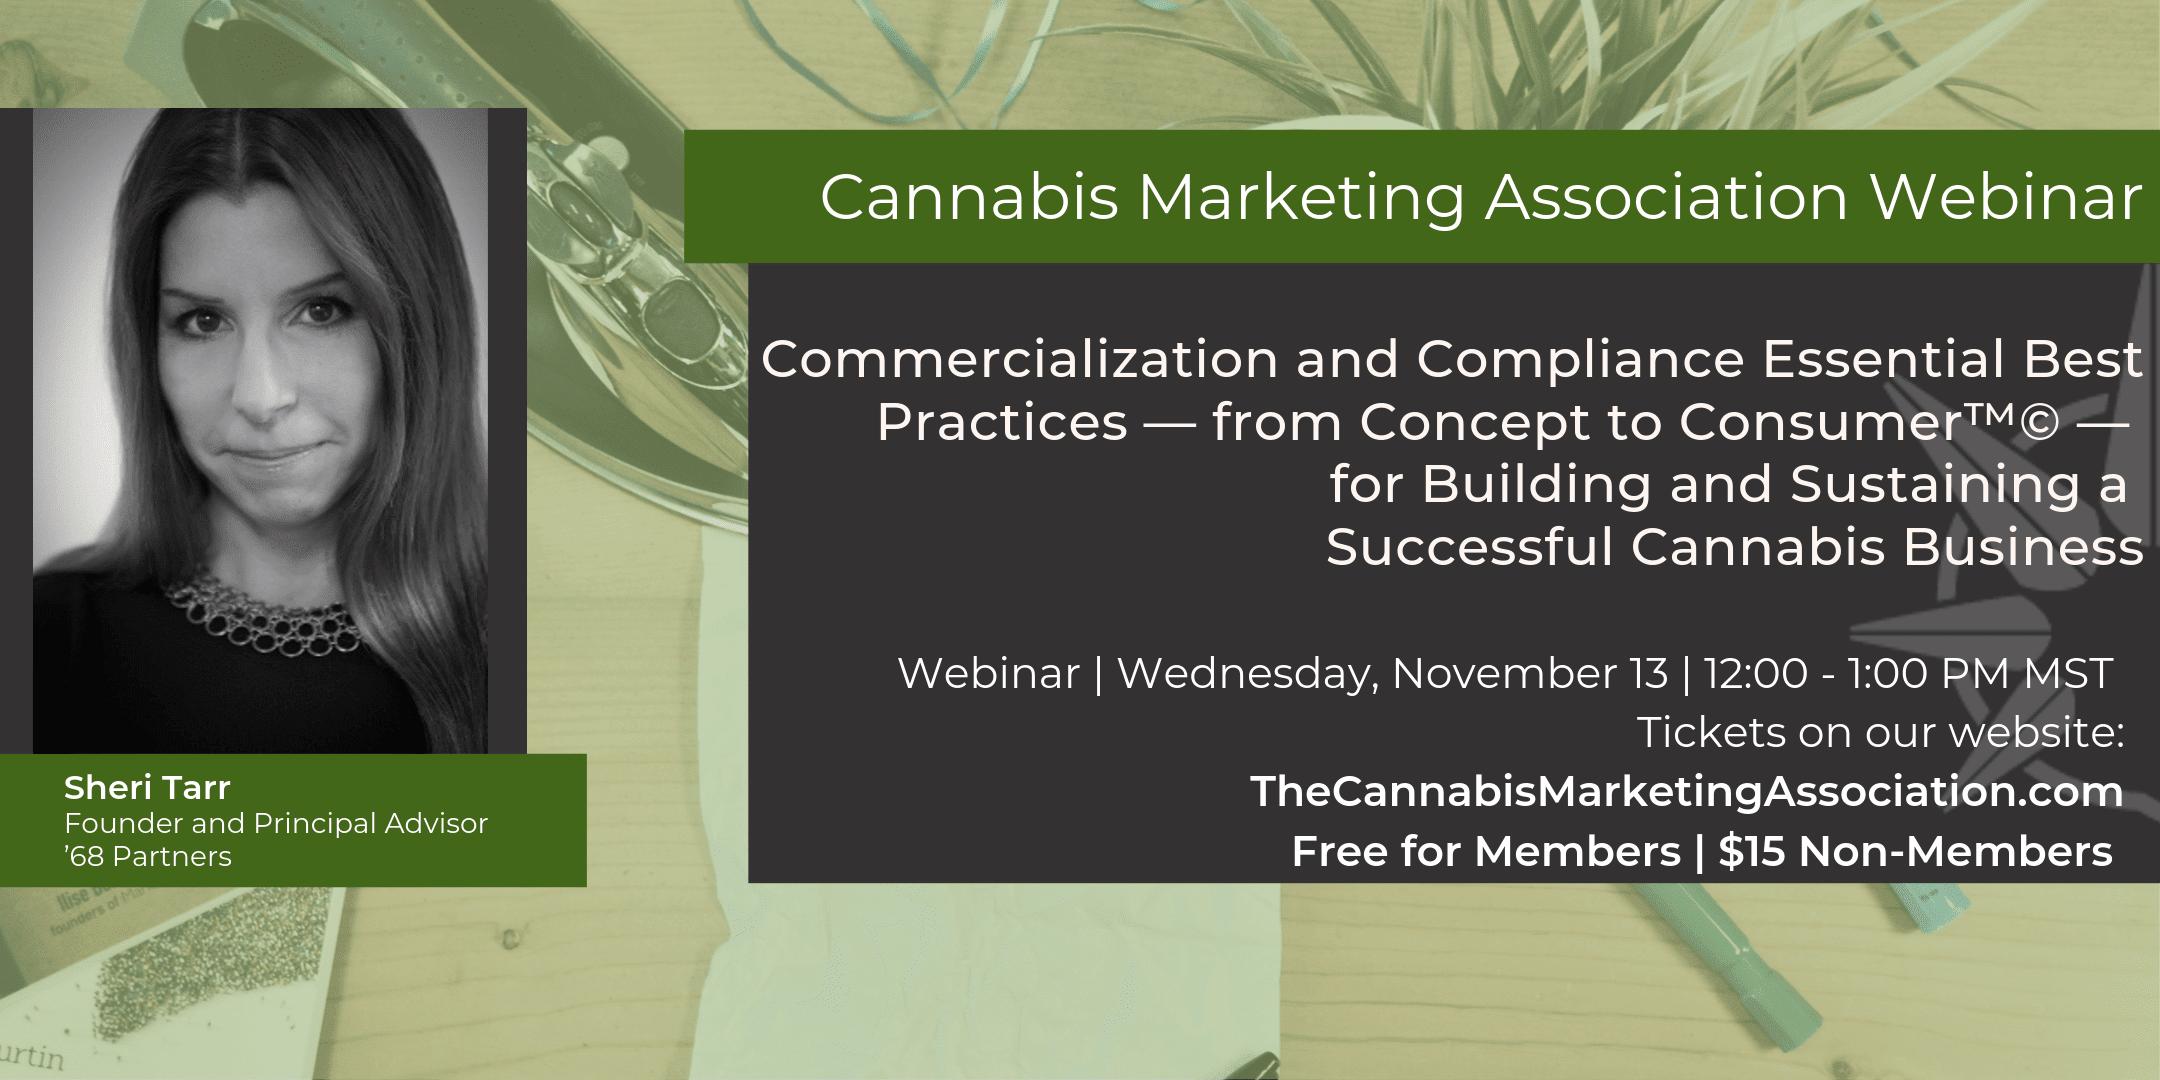 Cannabis Marketing Association Compliance Webinar